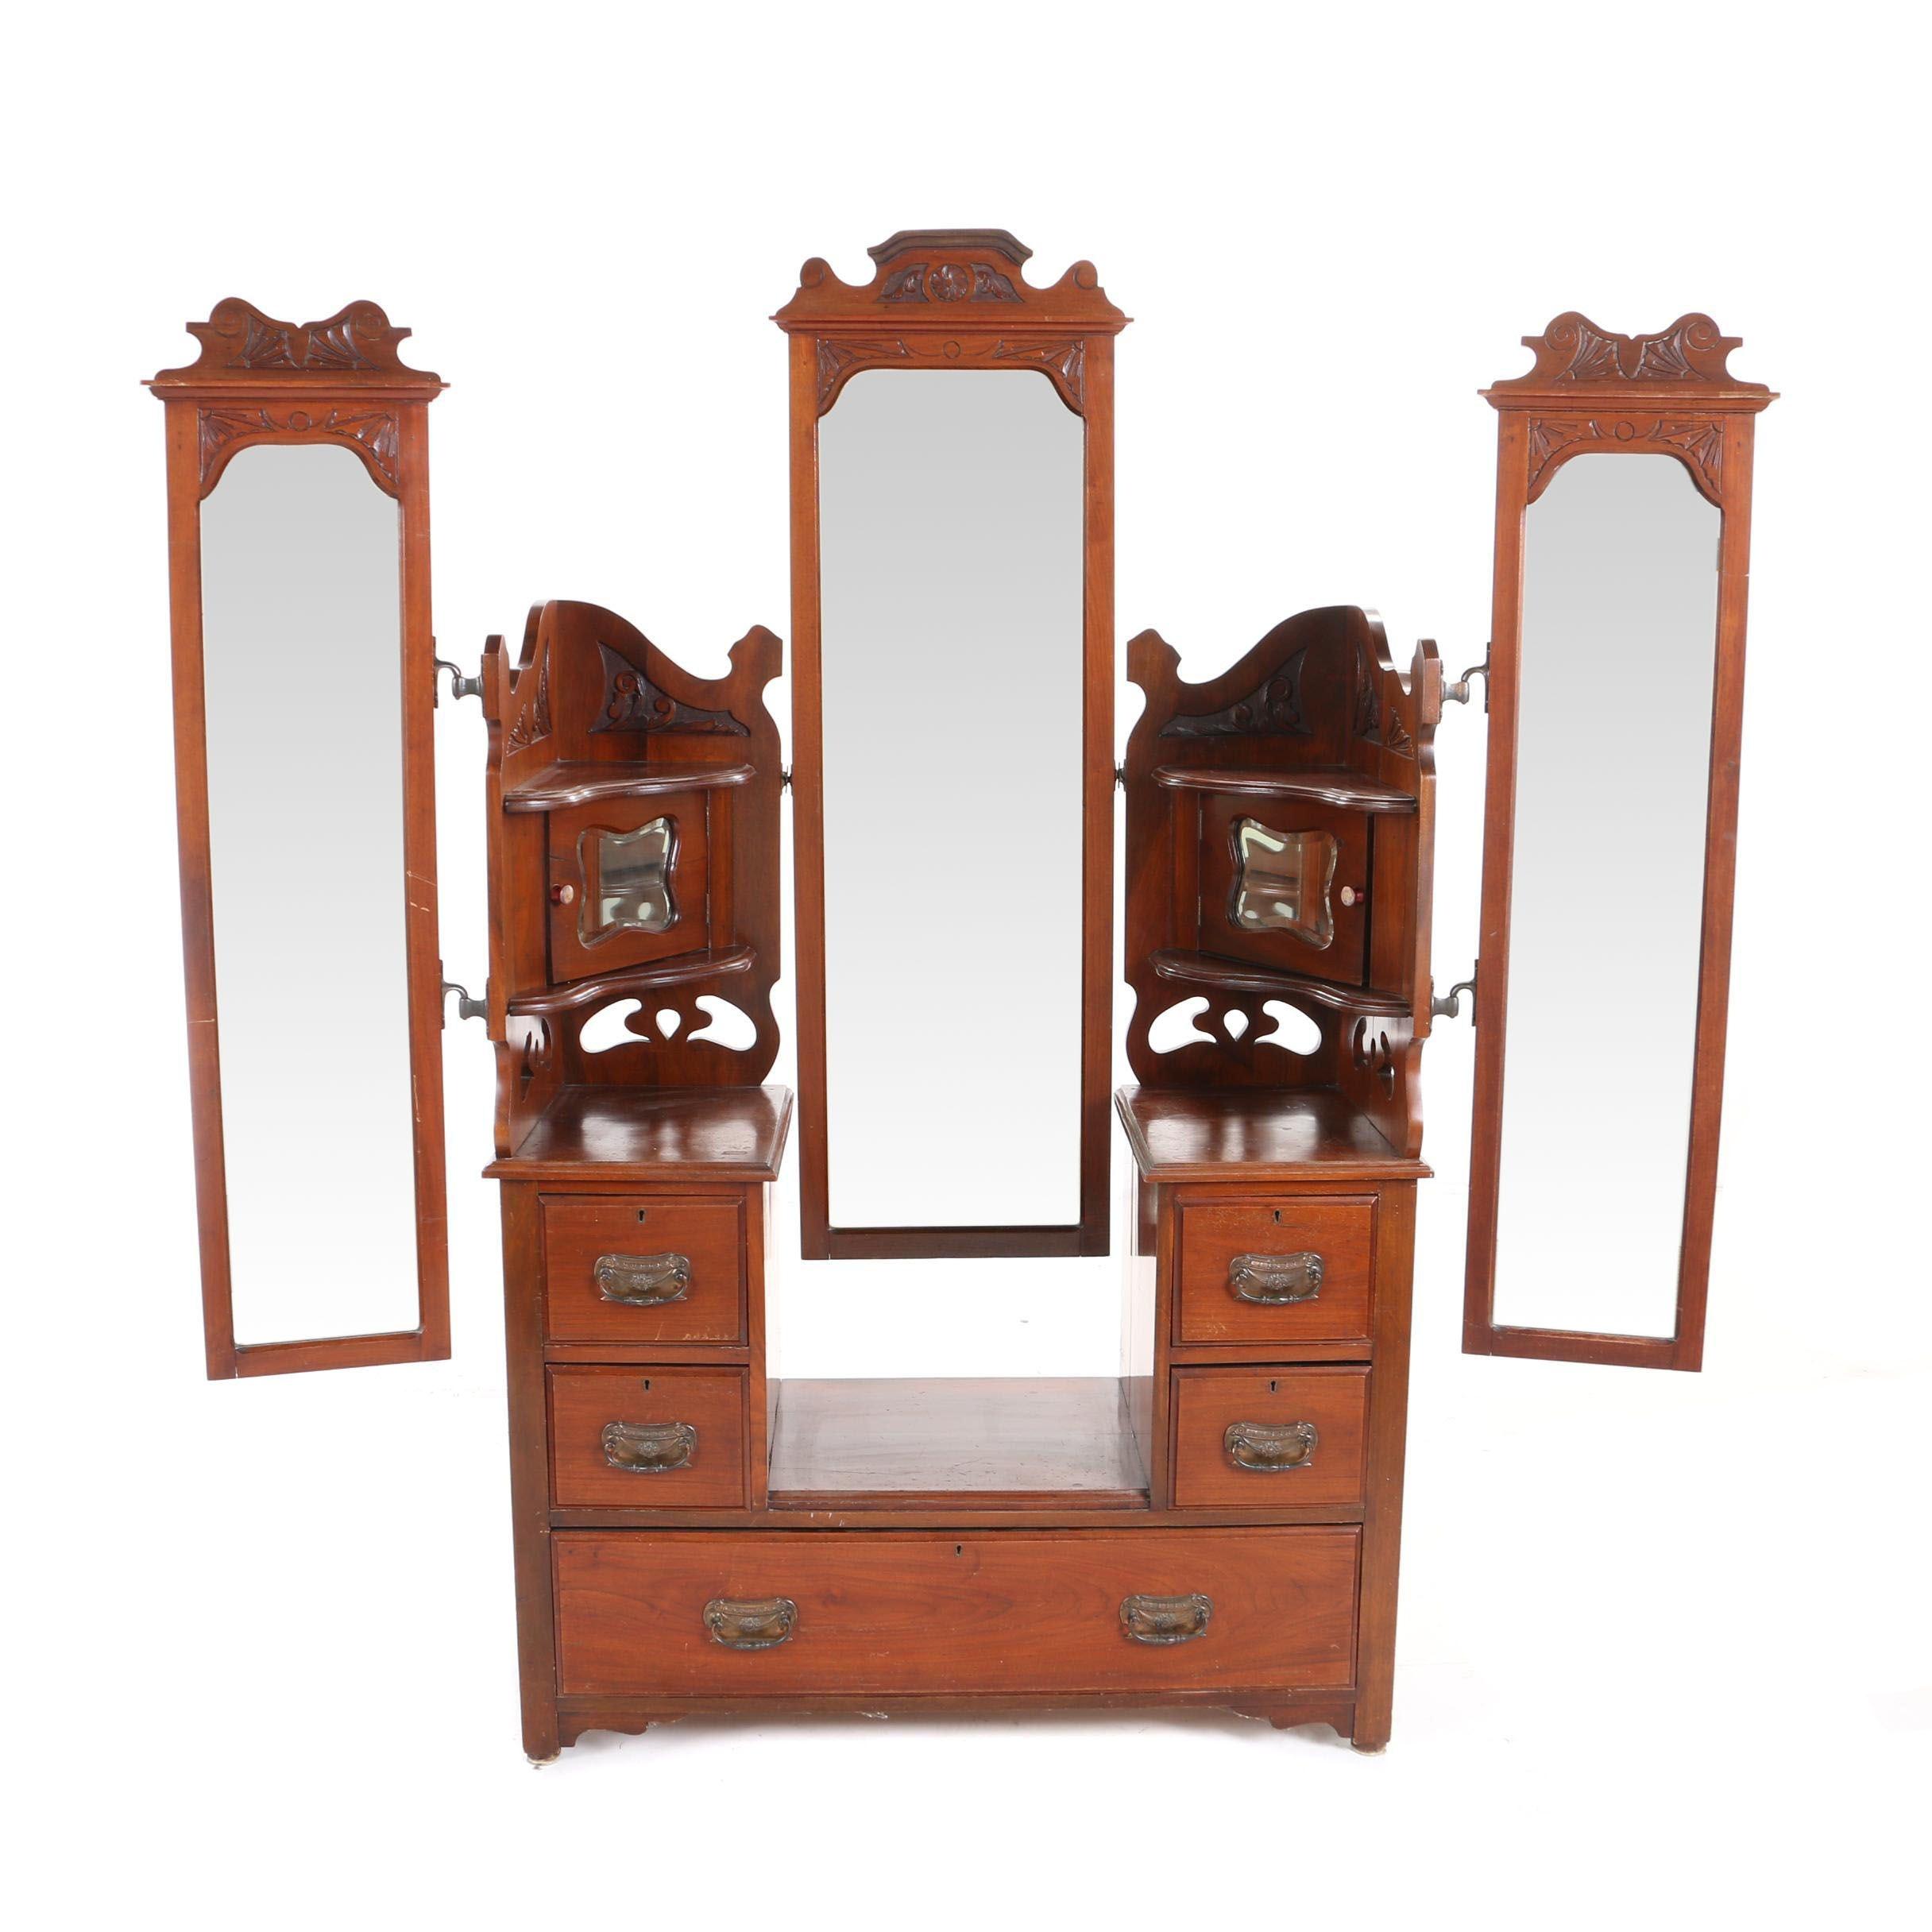 Edwardian Walnut Triple-Mirror Dressing Table, Early 20th Century